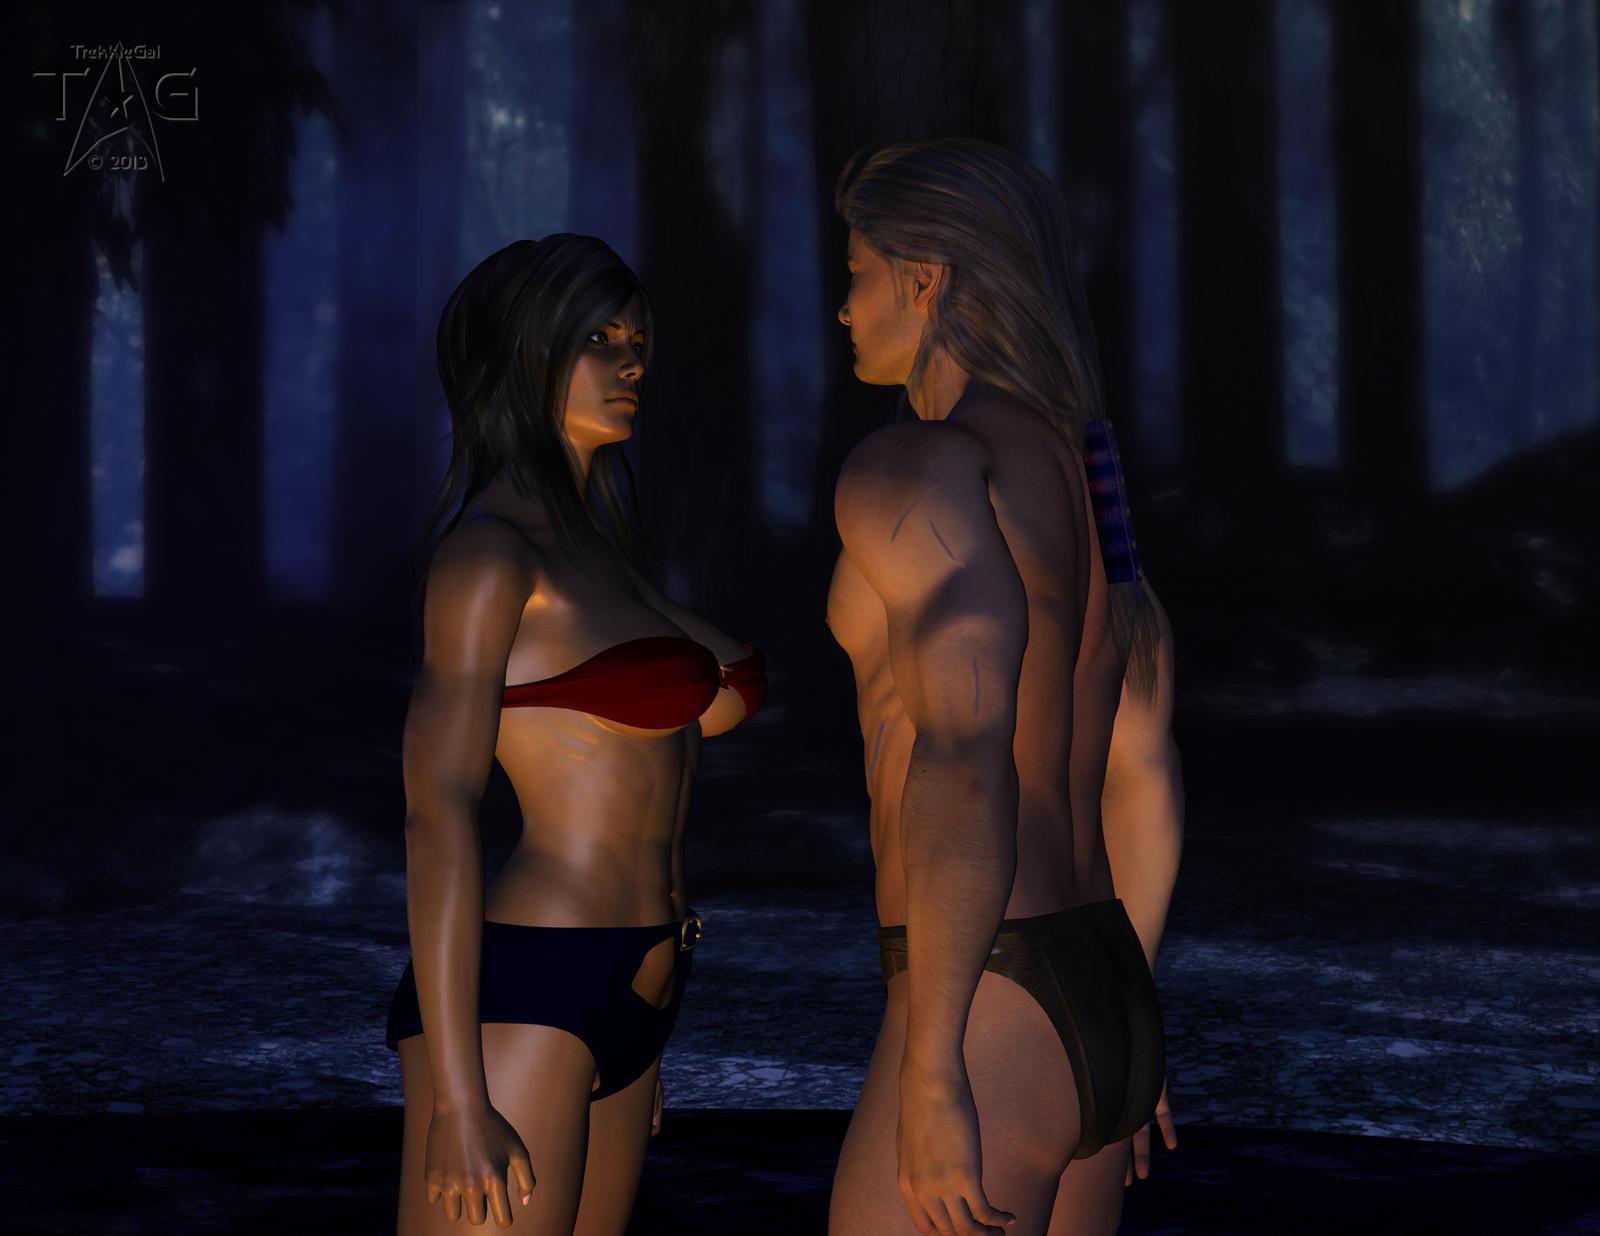 Amazonos: Ch.4 Of Gods, and Amazons by TrekkieGal